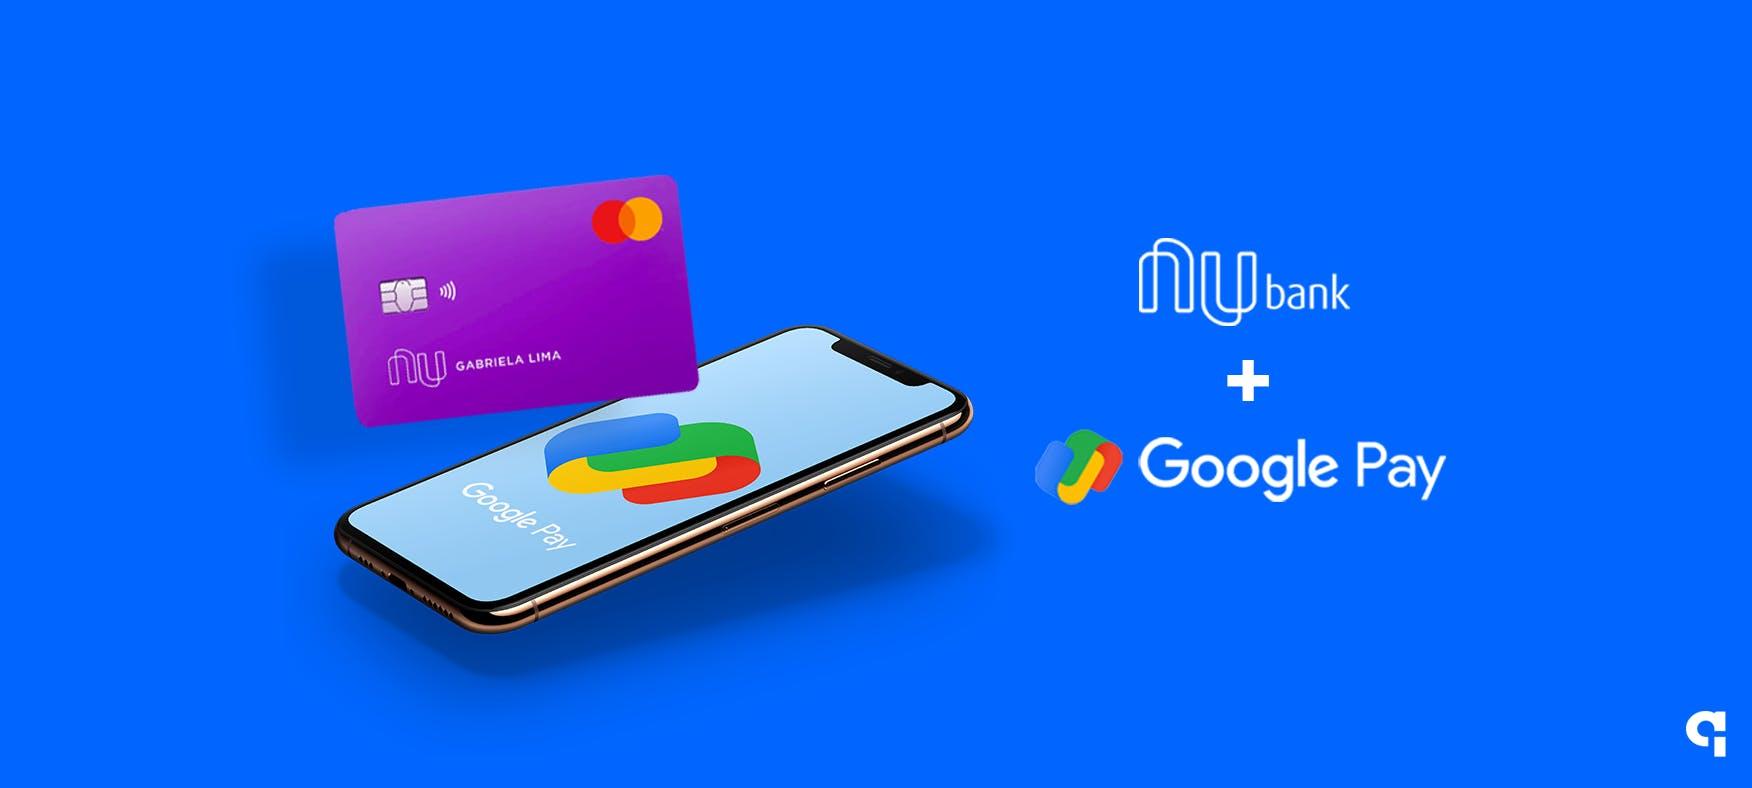 Nubank e Google Pay